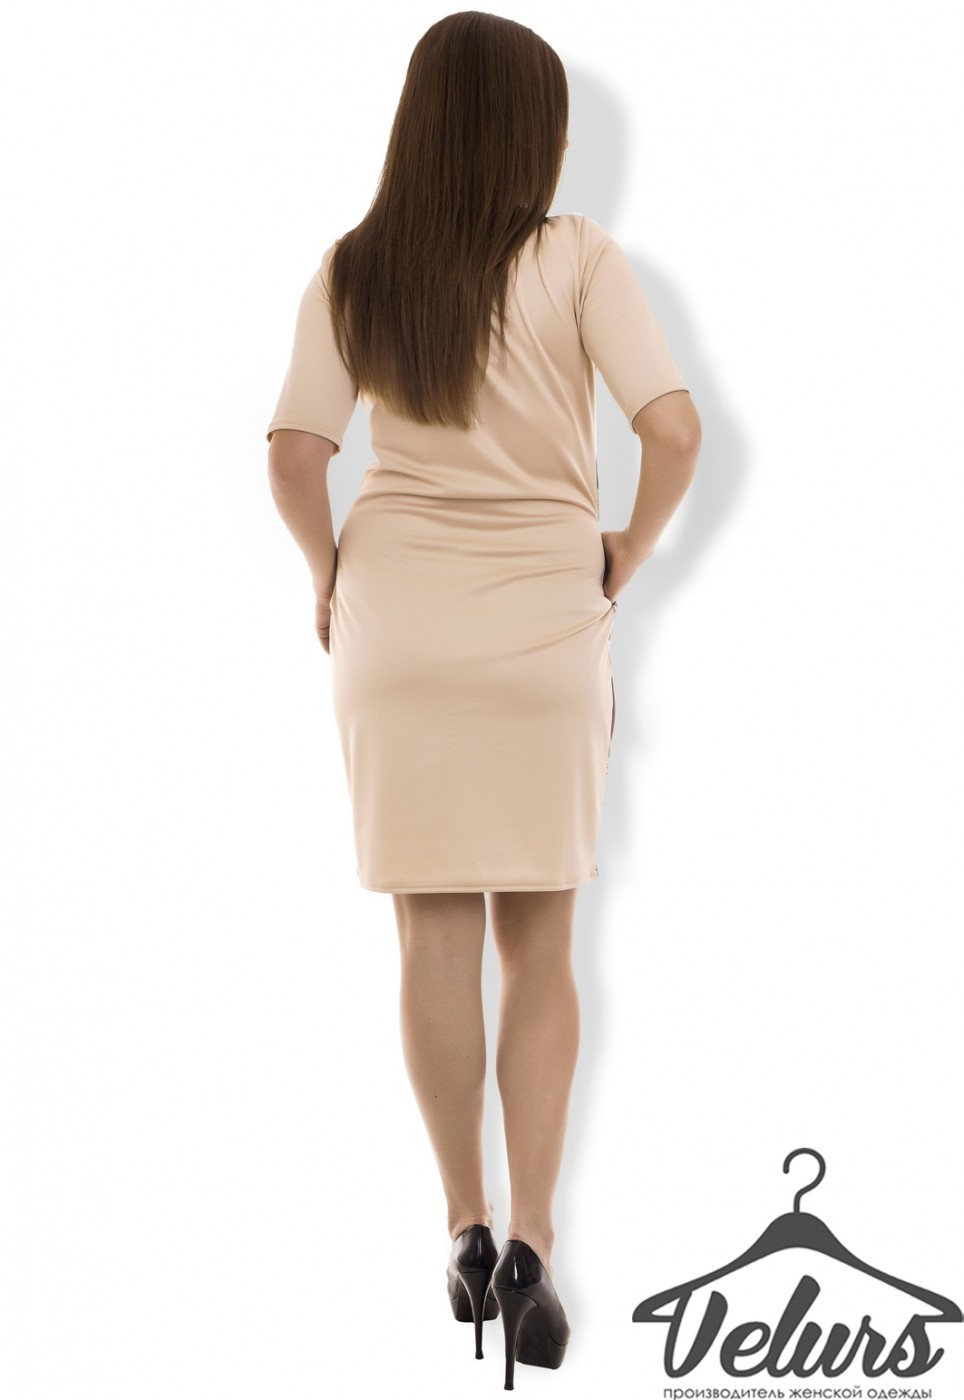 Velurs: Платье 212110 - фото 6